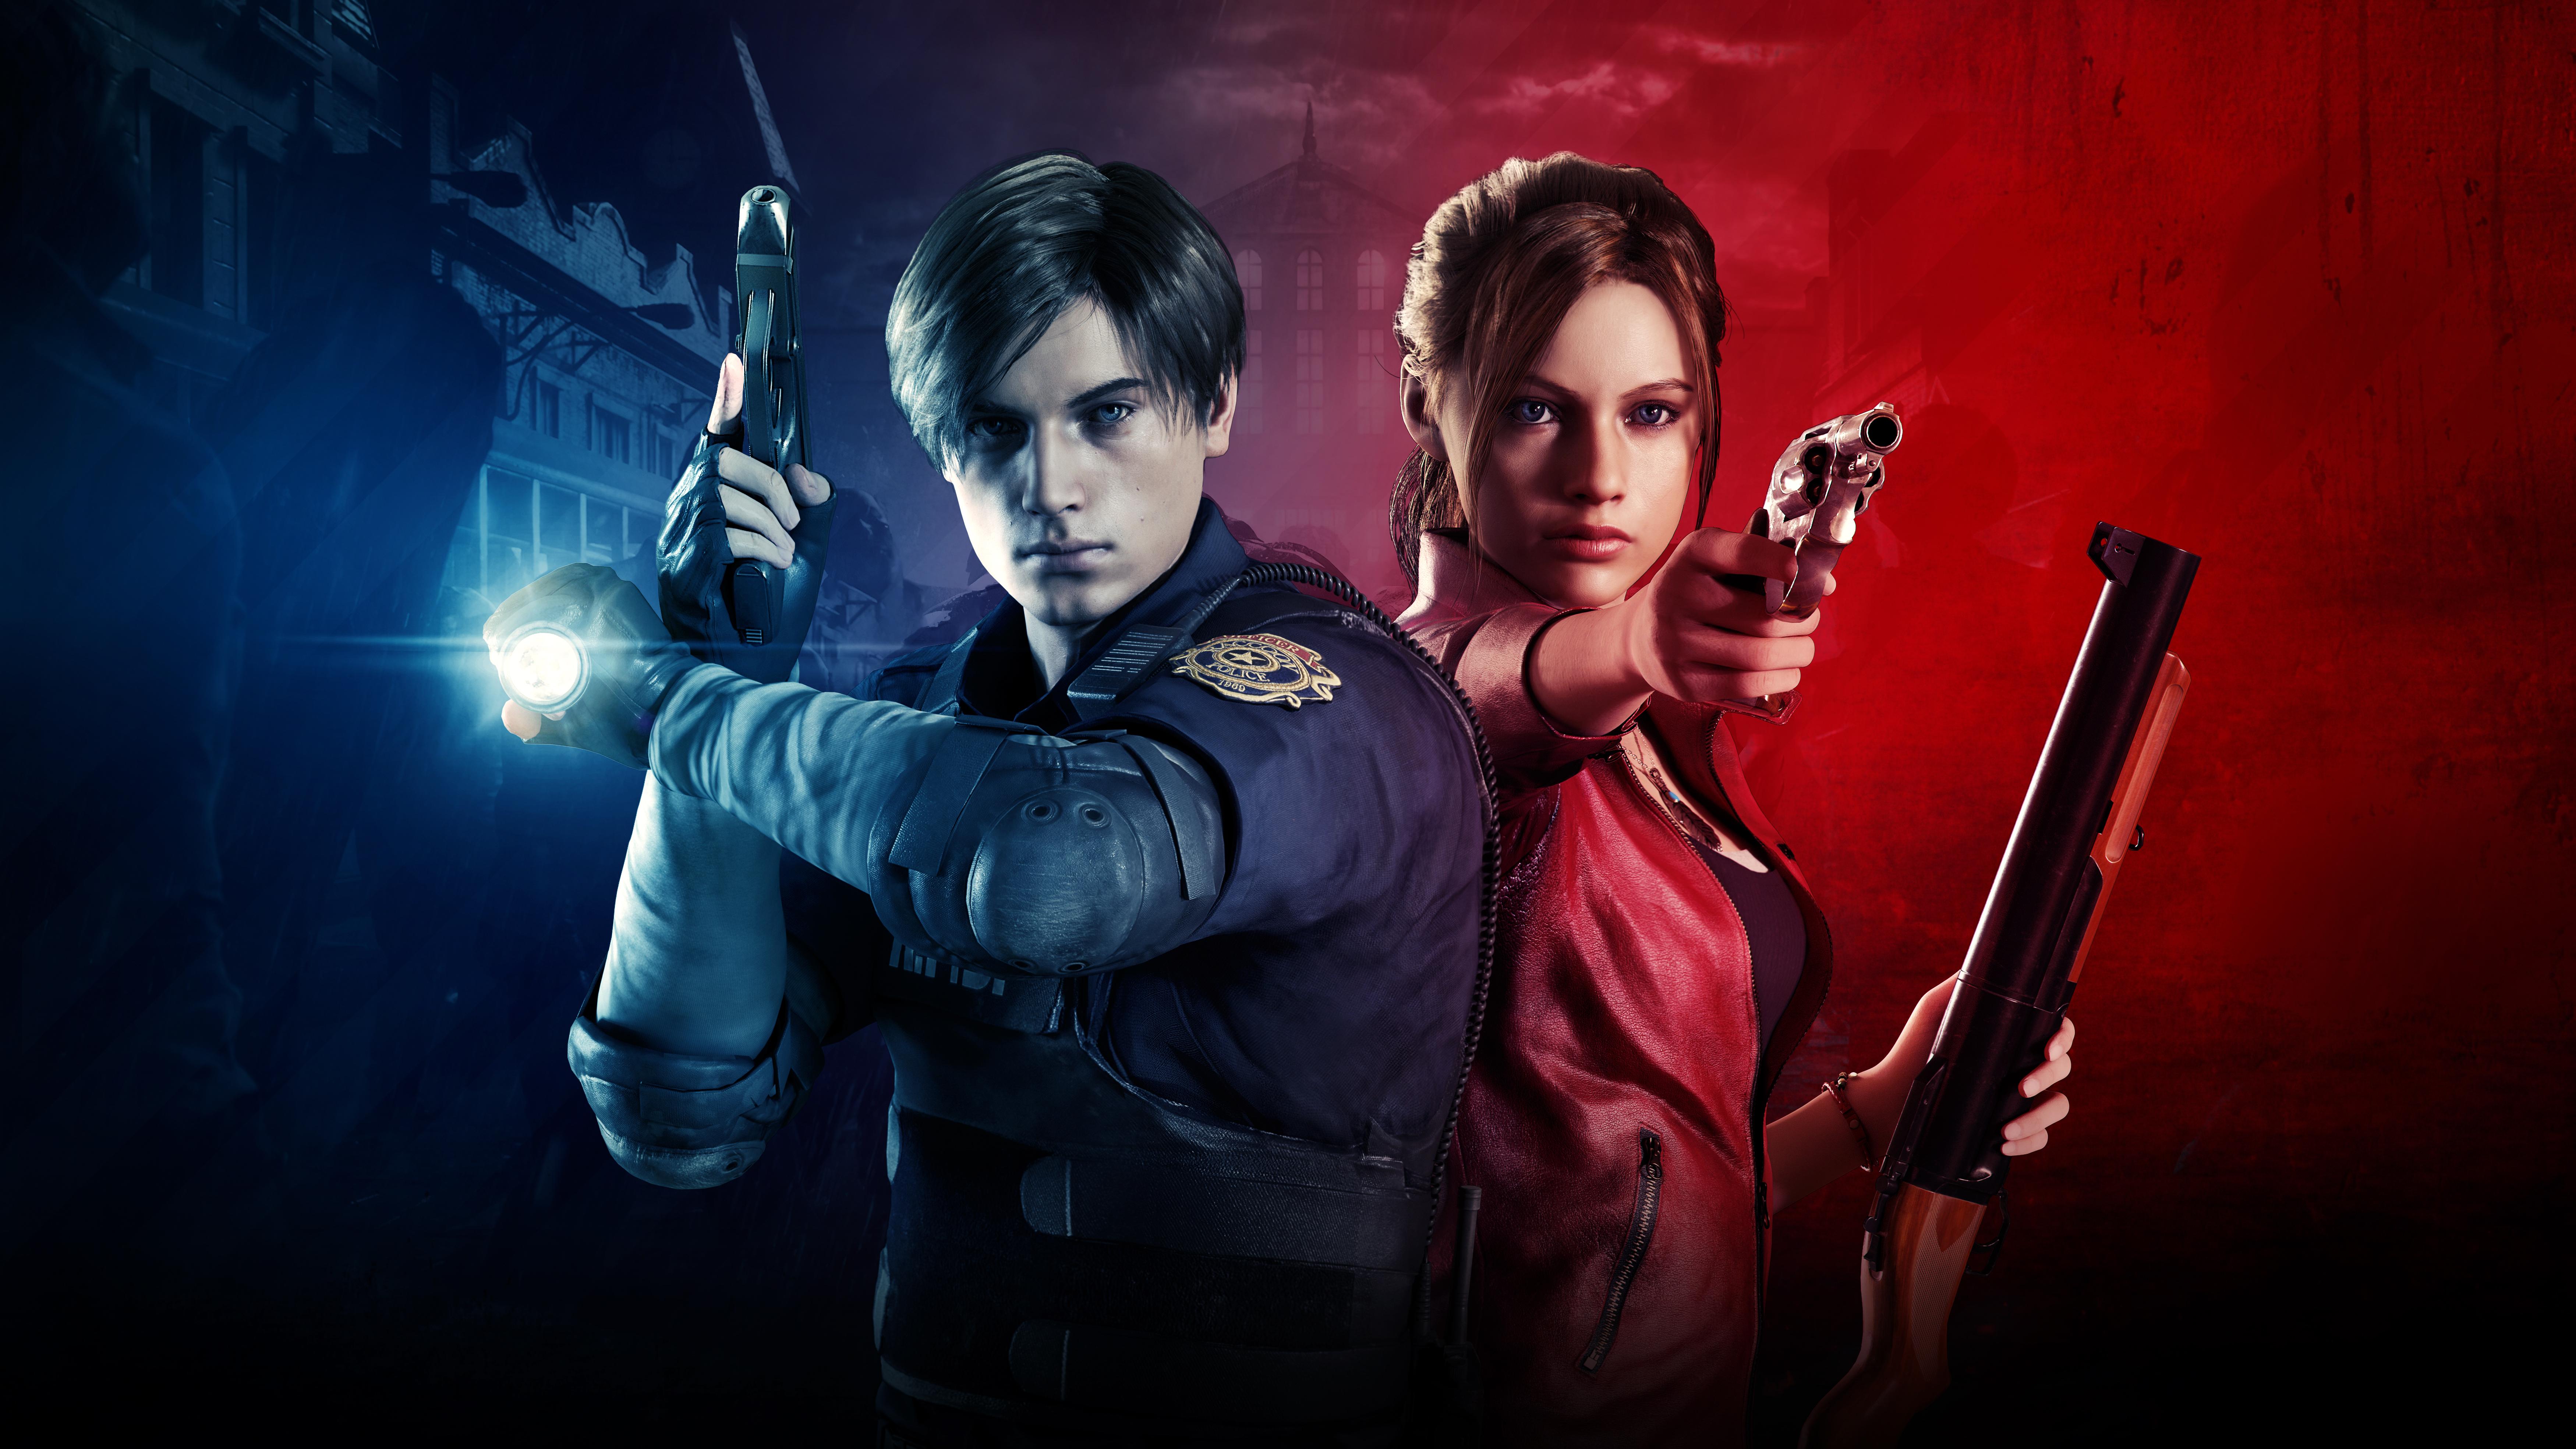 Resident Evil 2 2019 5k Retina Ultra Hd Wallpaper Background